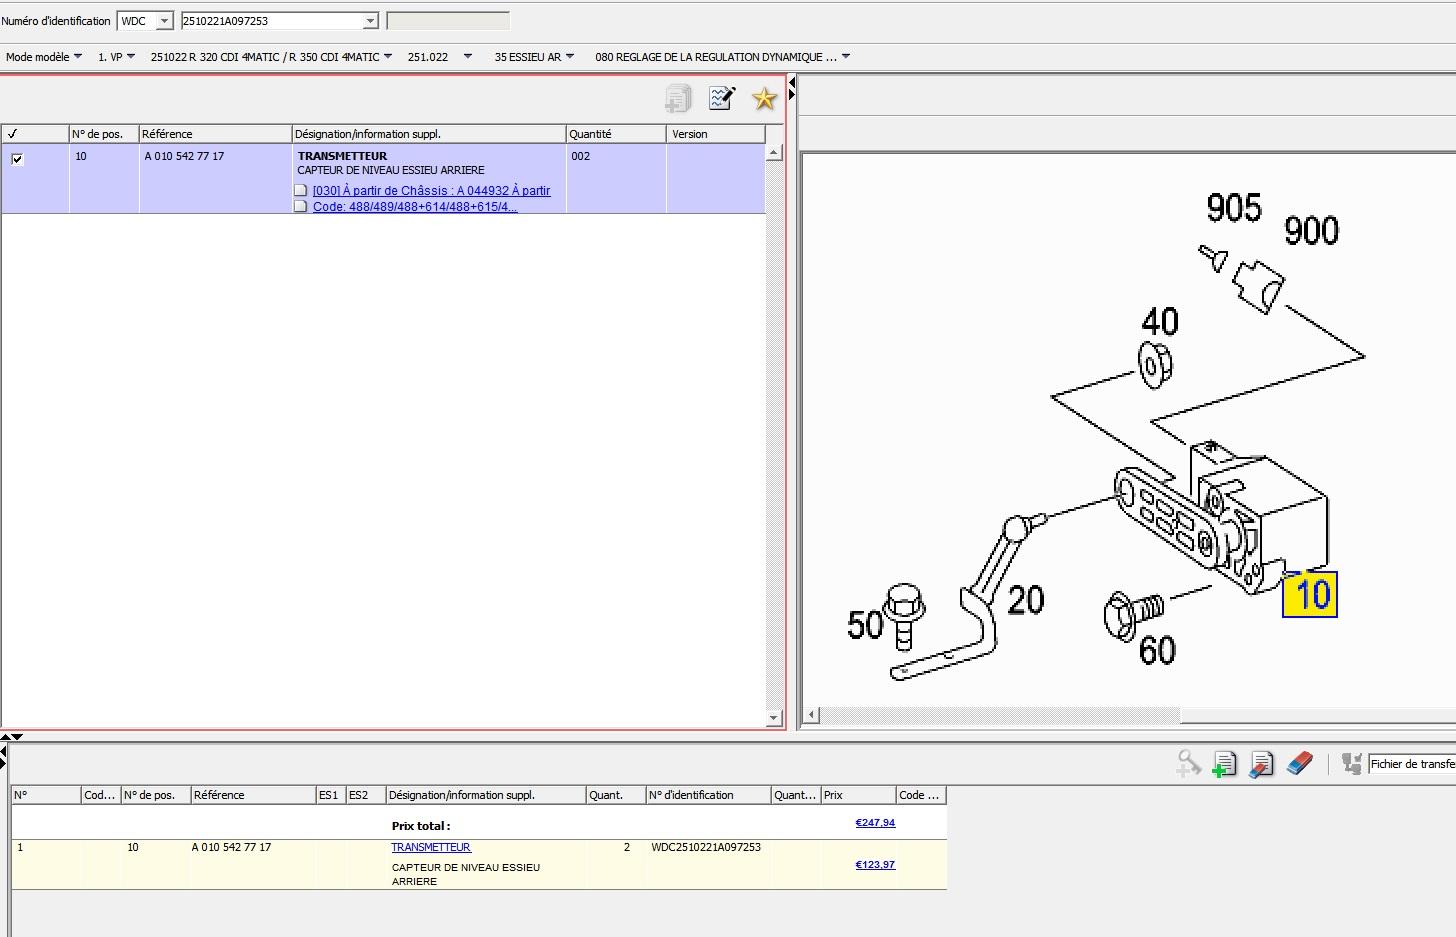 Capteurs-assiette-arriere-1-WDC2510221A097253.jpg